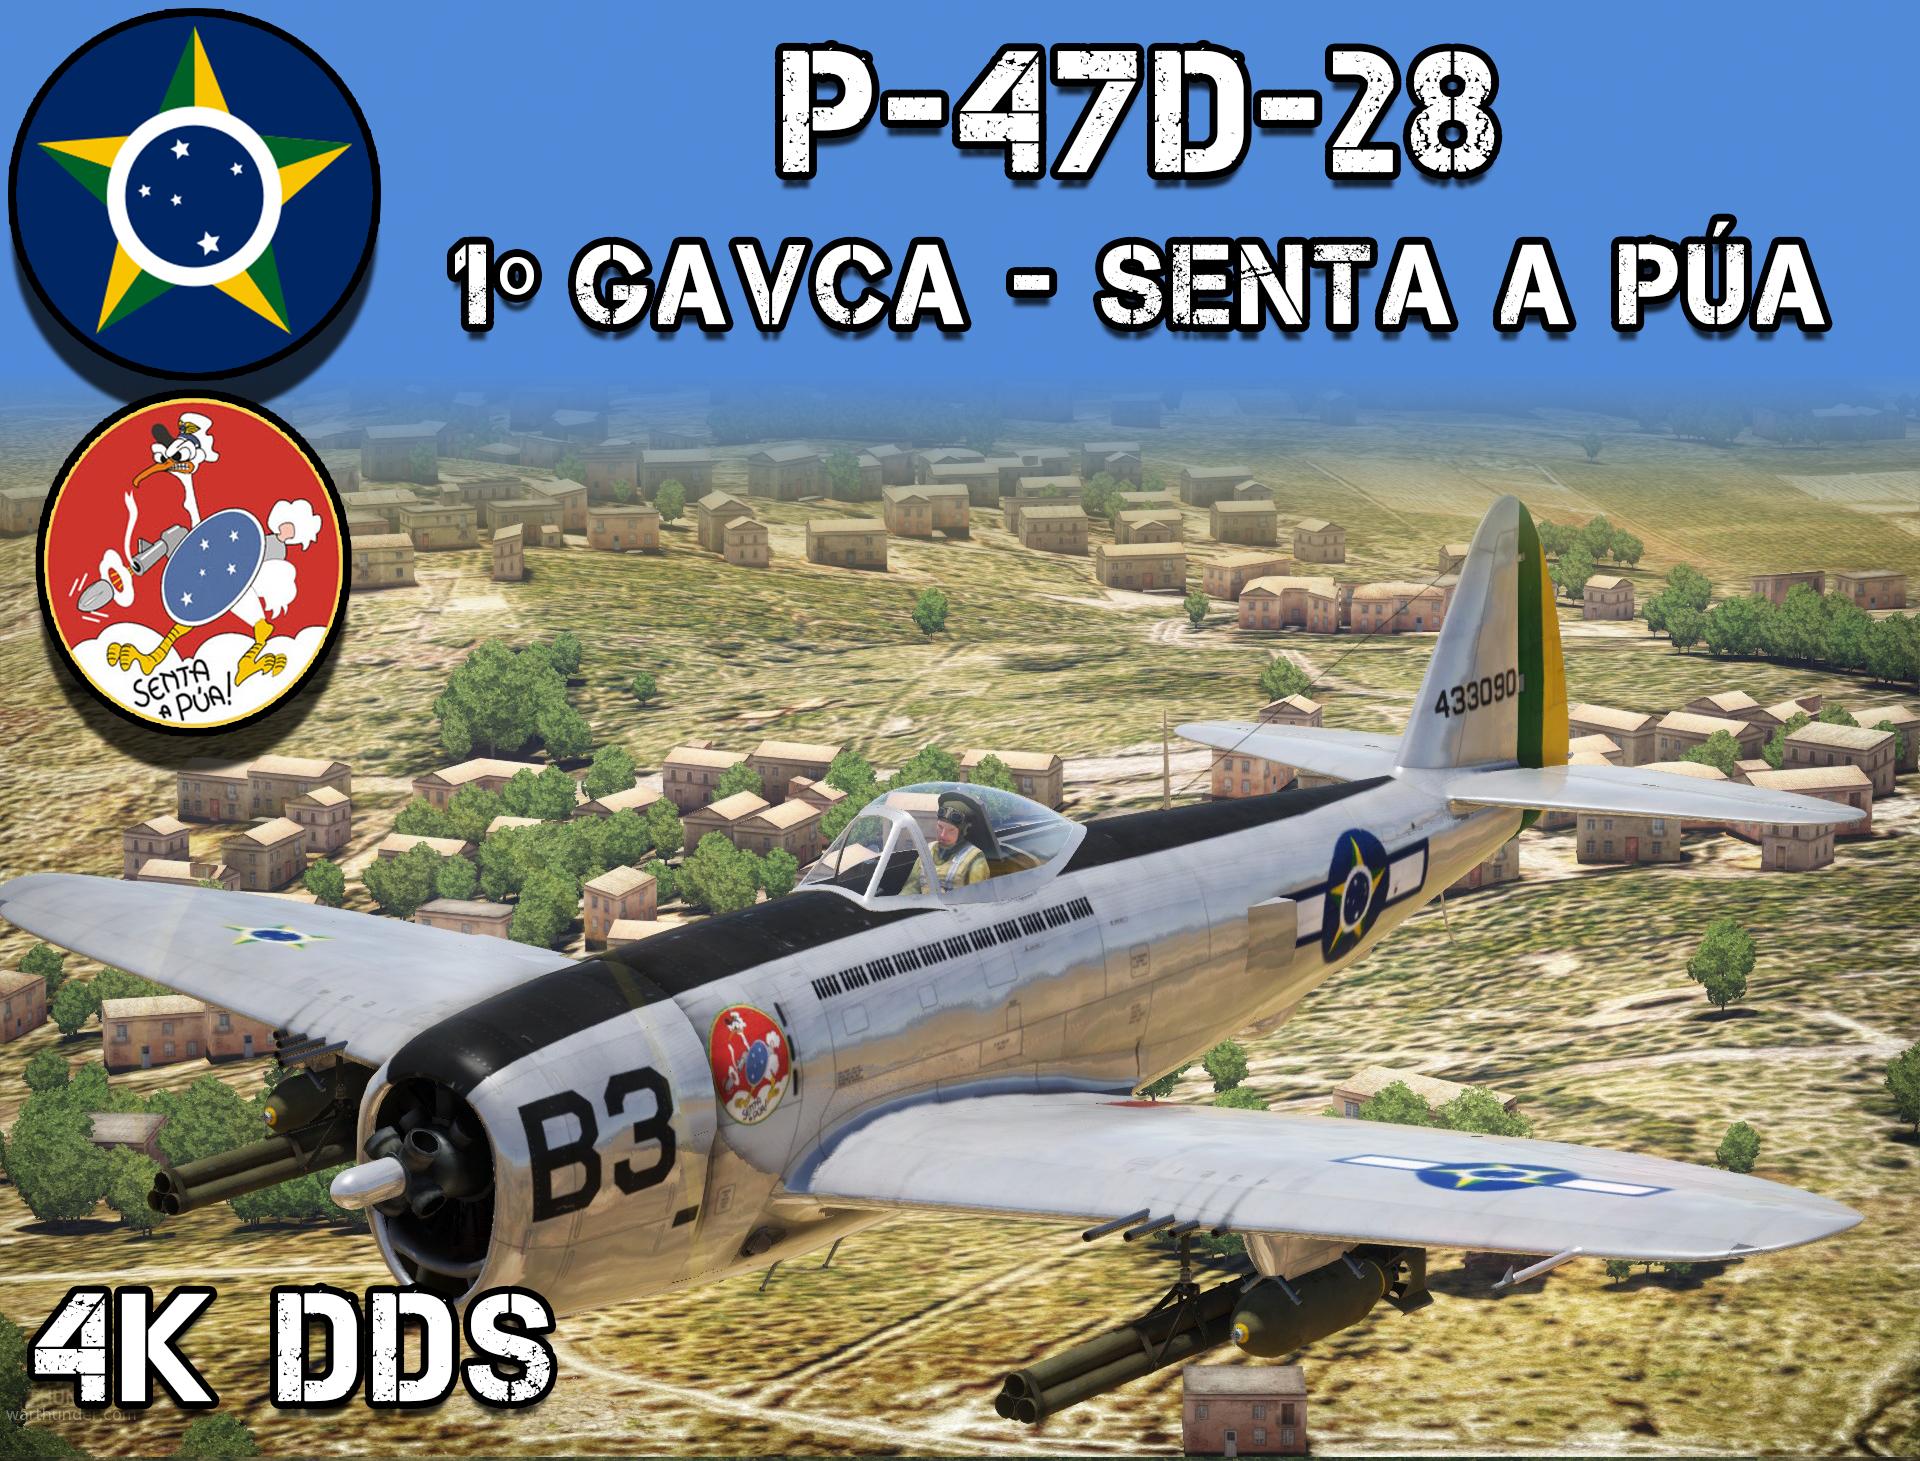 FAB_P-47D-28_thumbnail.jpg